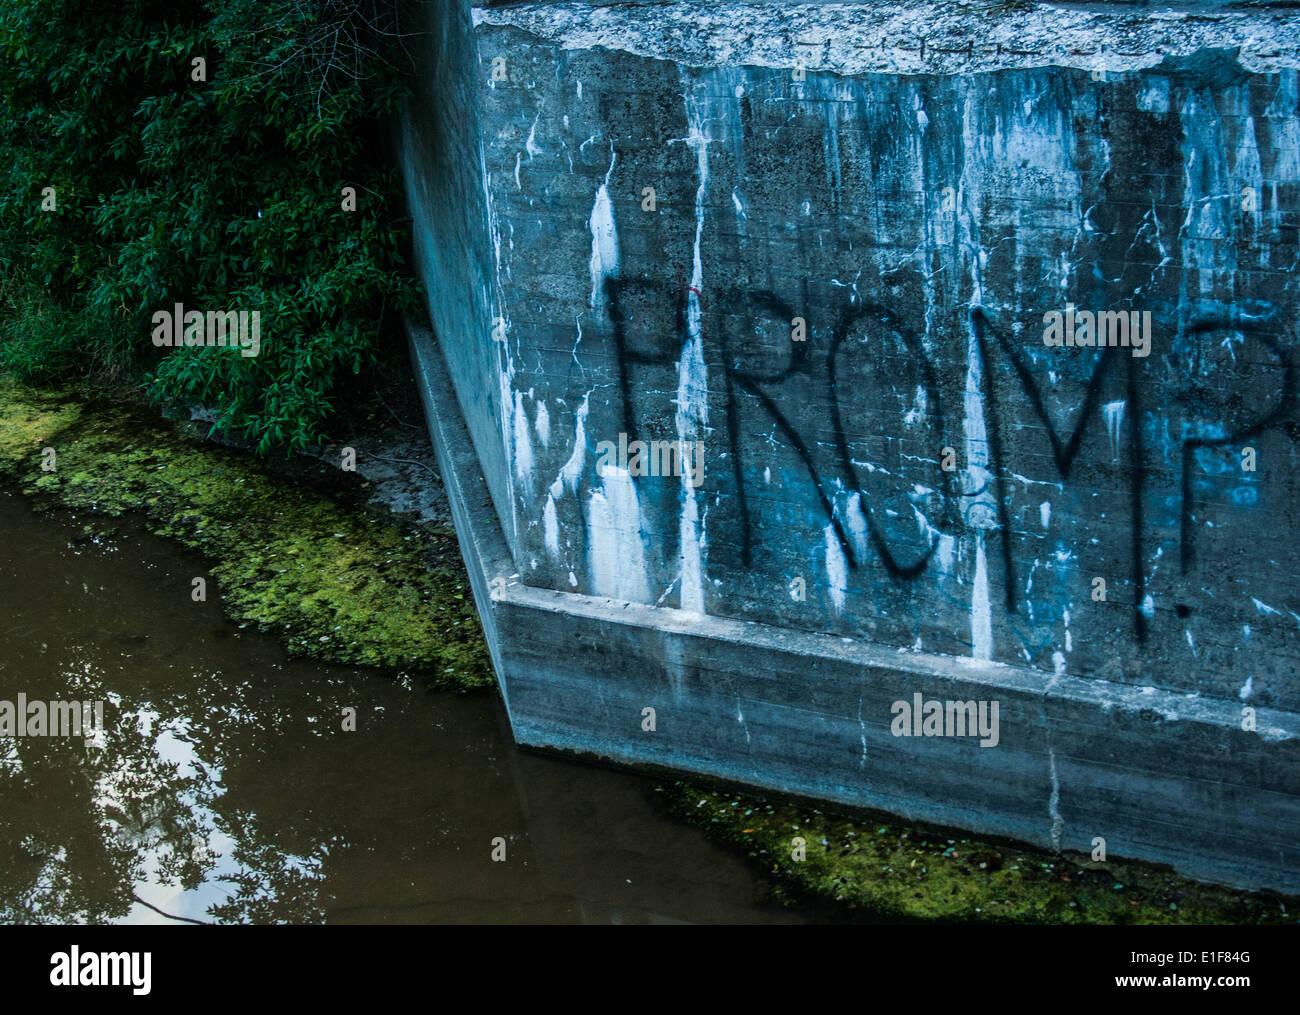 Unique Graffiti Prom Proposal on Rock Wall - Stock Image